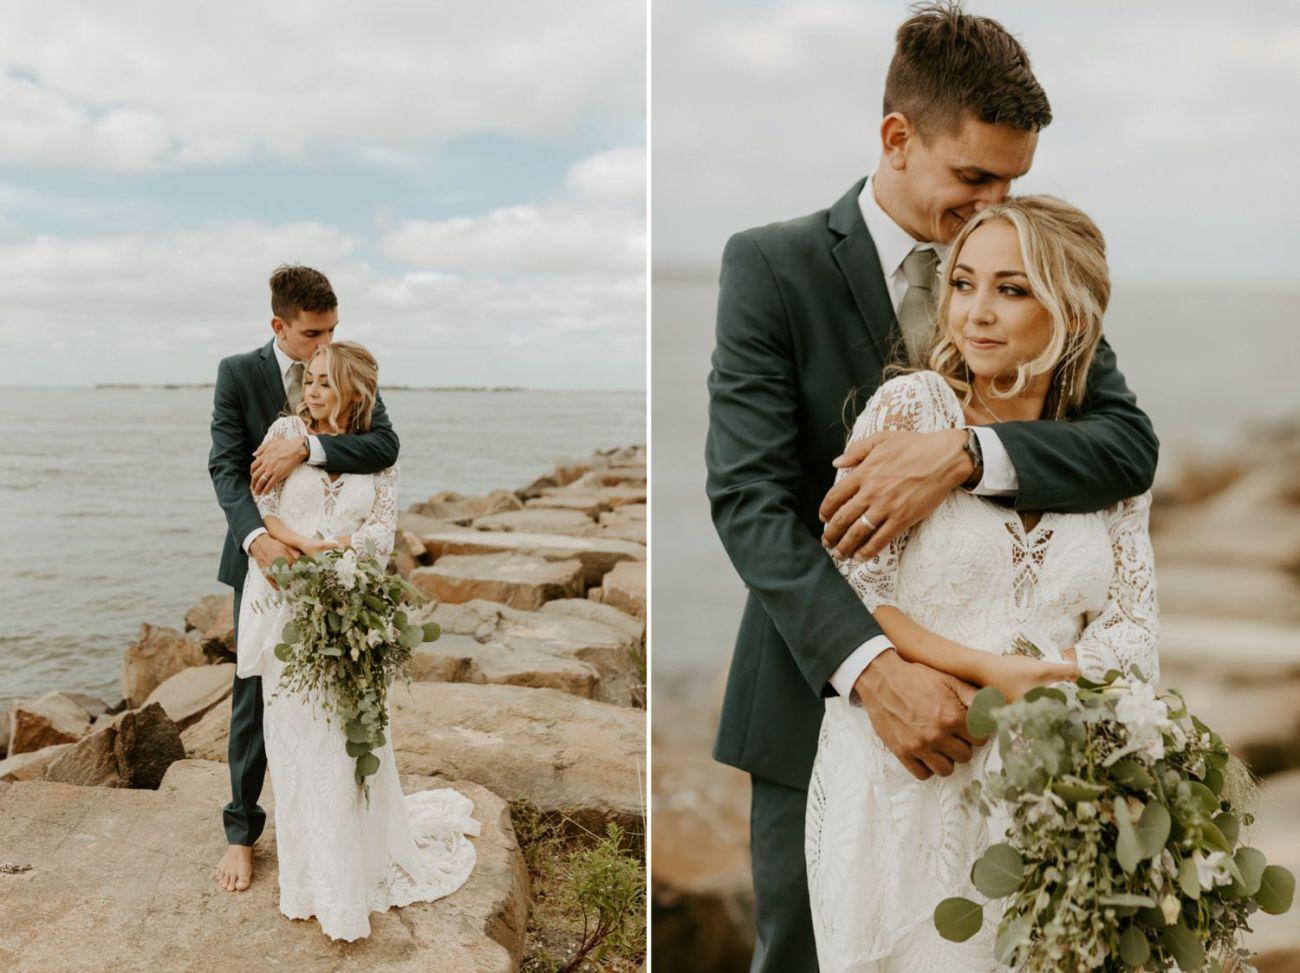 Long Beach Island Wedding Barnegat Lighthouse Wedding Ceremony New Jersey Wedding Anais Possamai Photography Oregon Wedding Photographer 0045